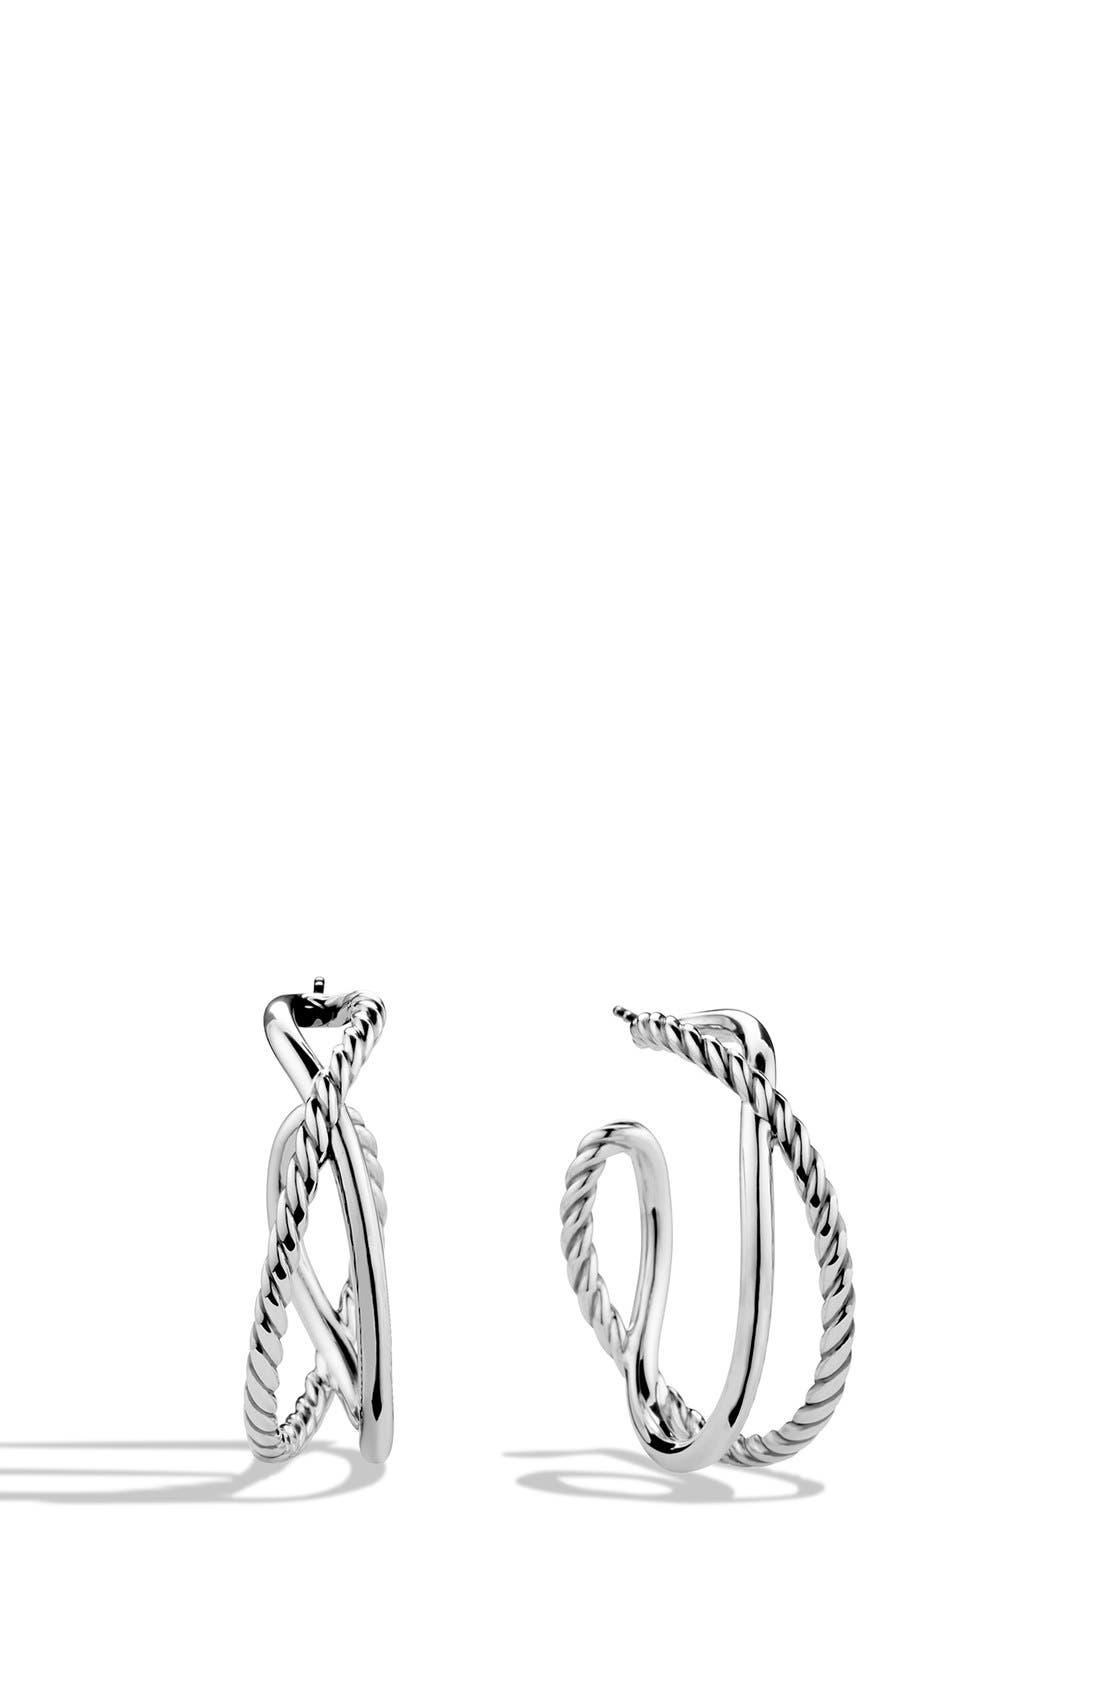 'Crossover' Hoop Earrings,                             Main thumbnail 1, color,                             SILVER